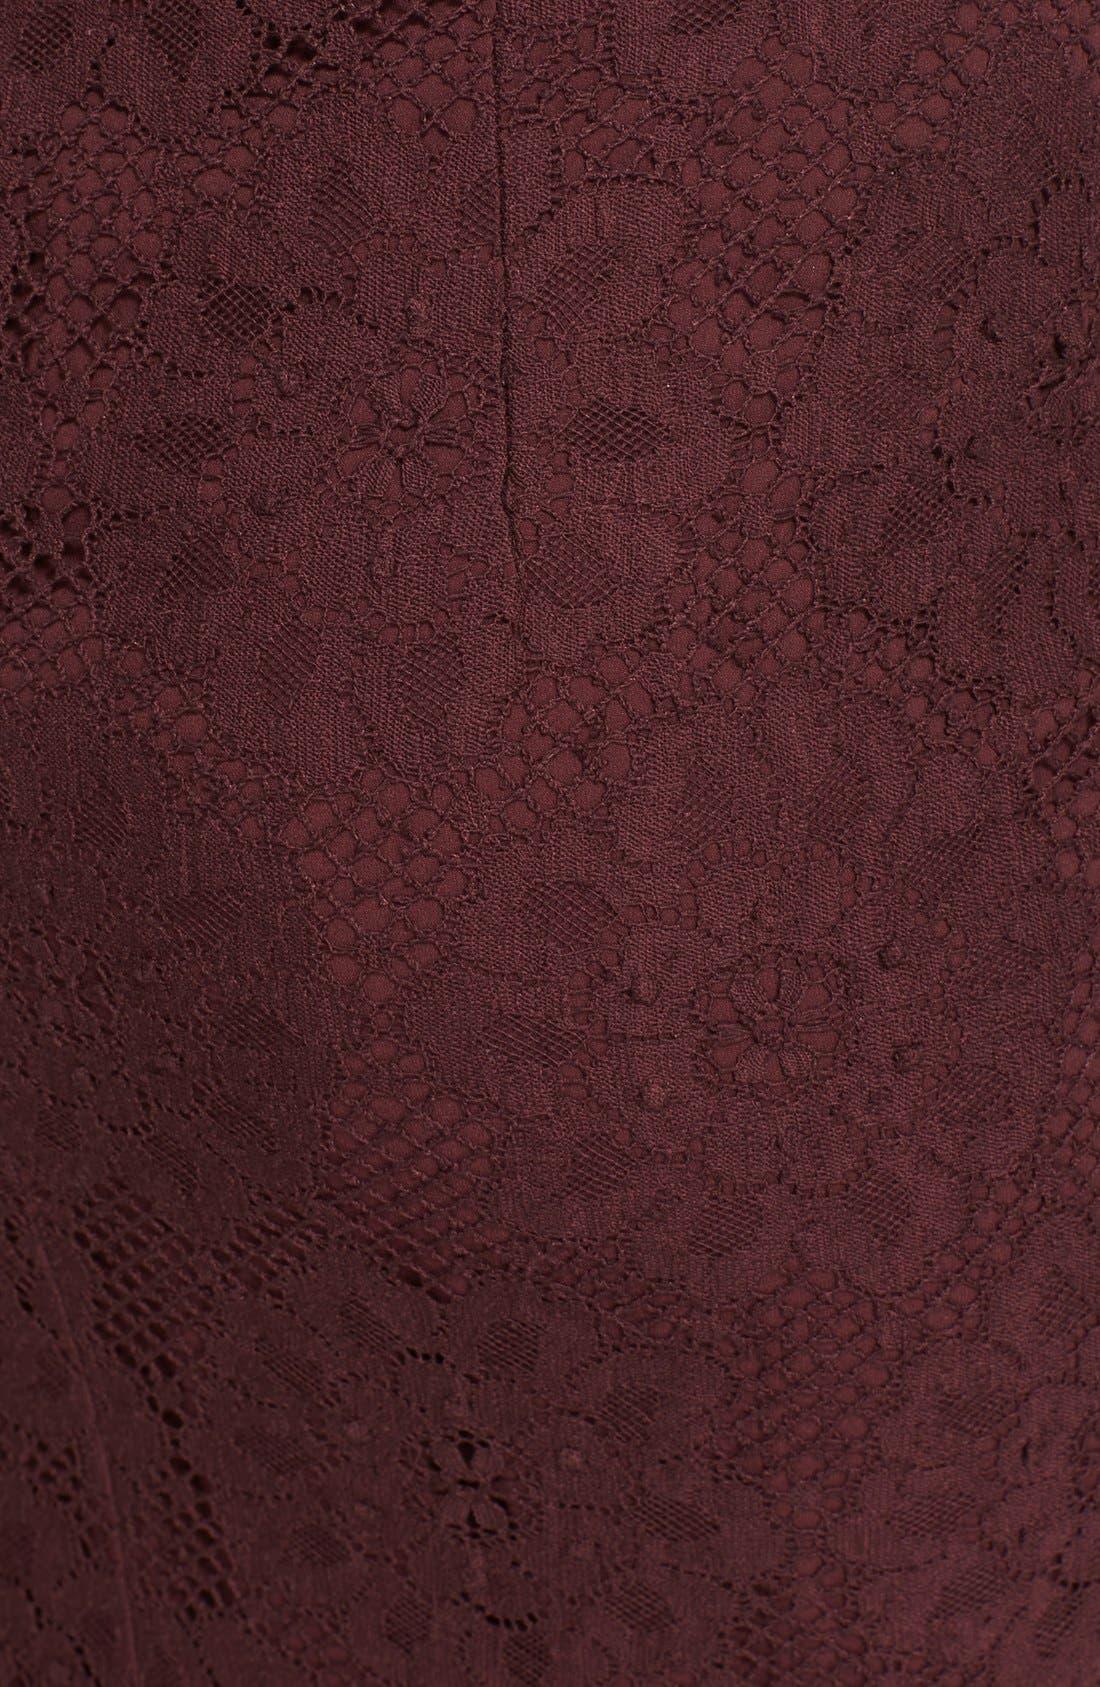 Alternate Image 3  - Burberry London Guipure Lace Pencil Skirt